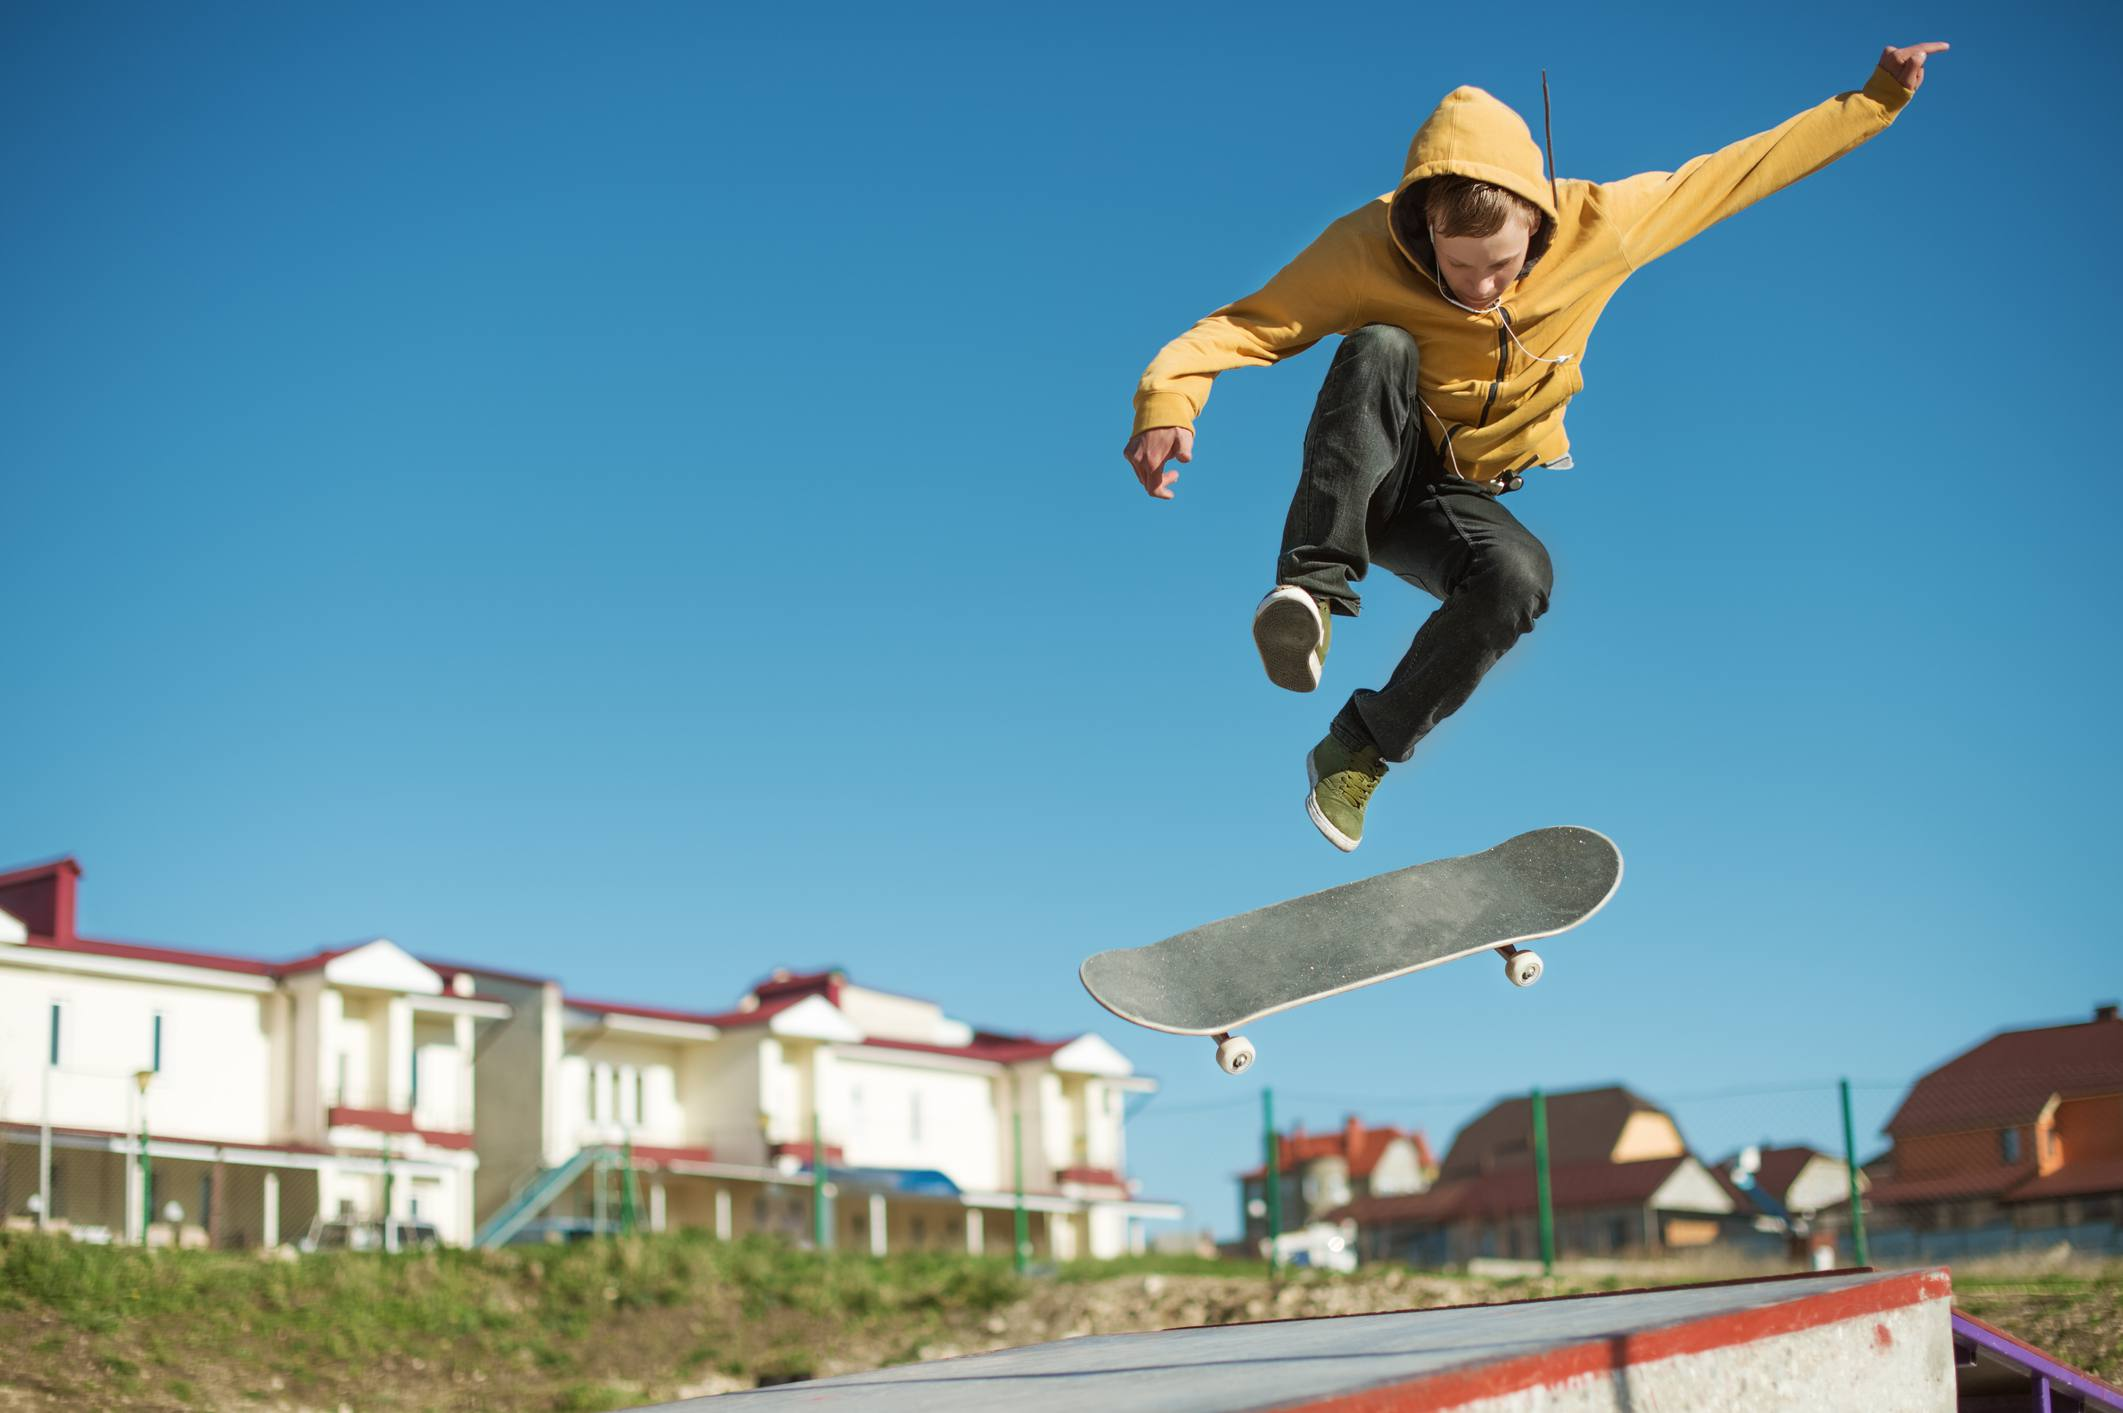 A teenager skateboarder does an flip trick